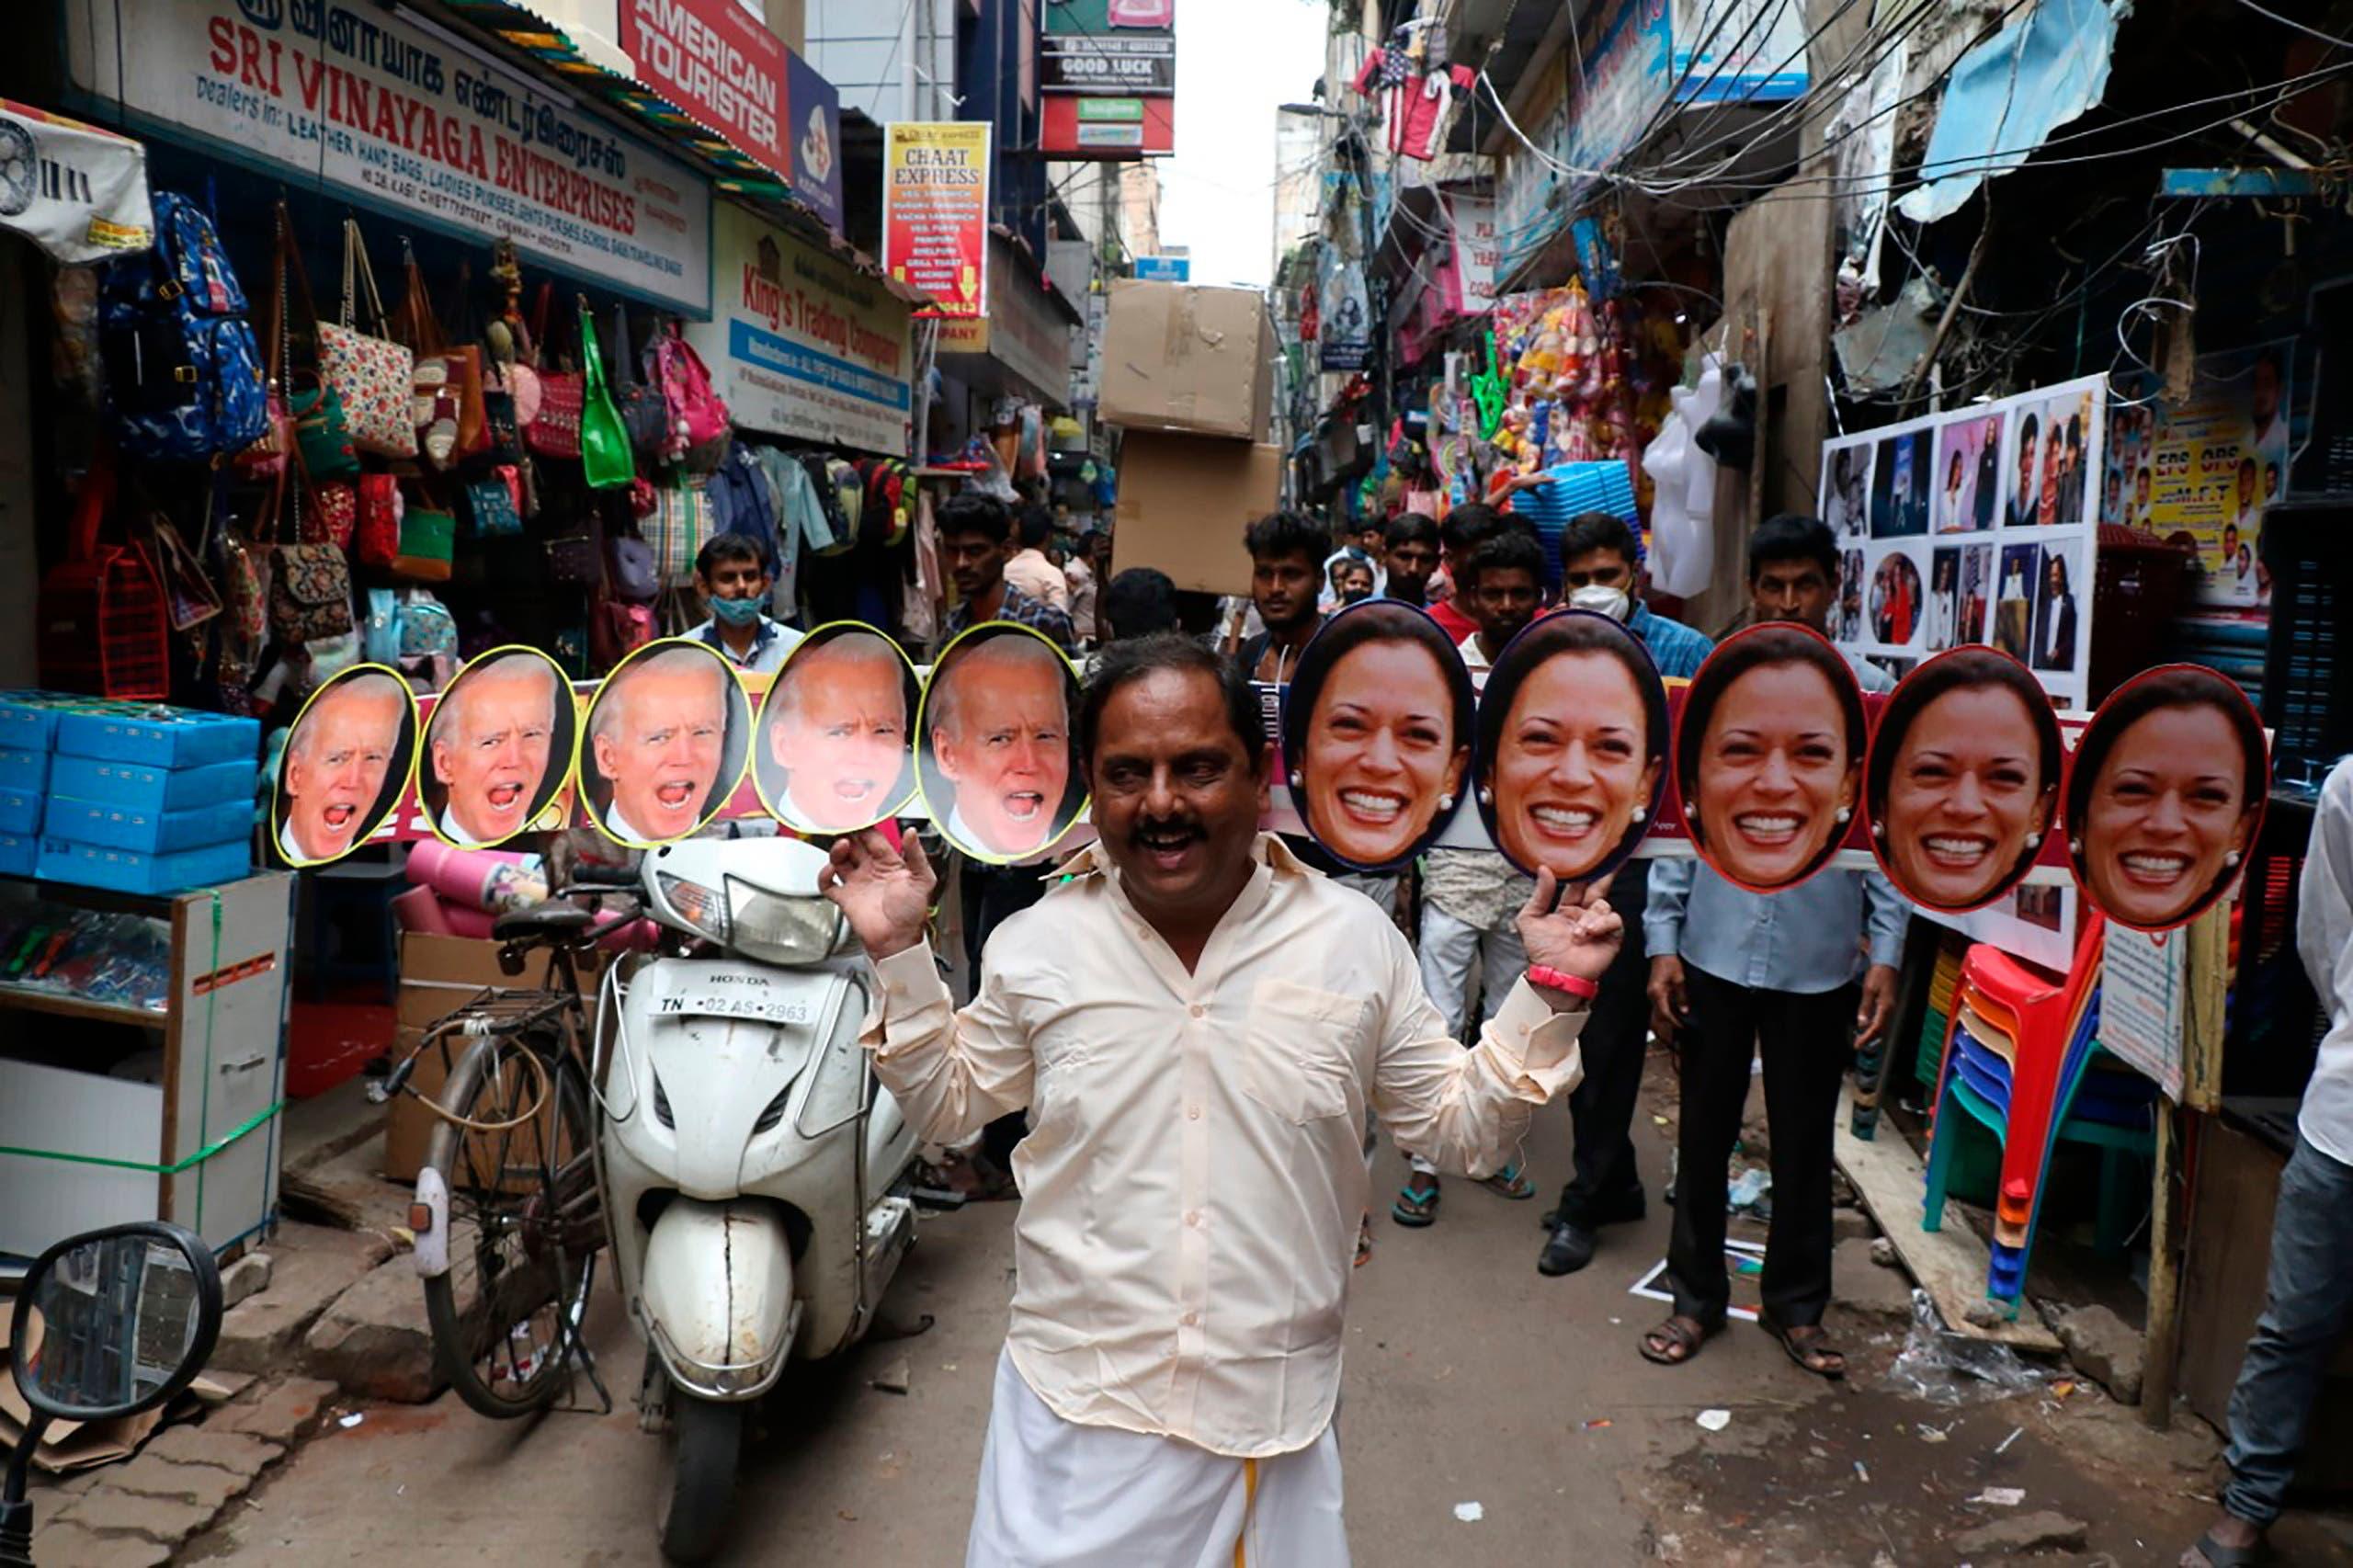 أحد سكان تشيناي  يرفع صور هاريس